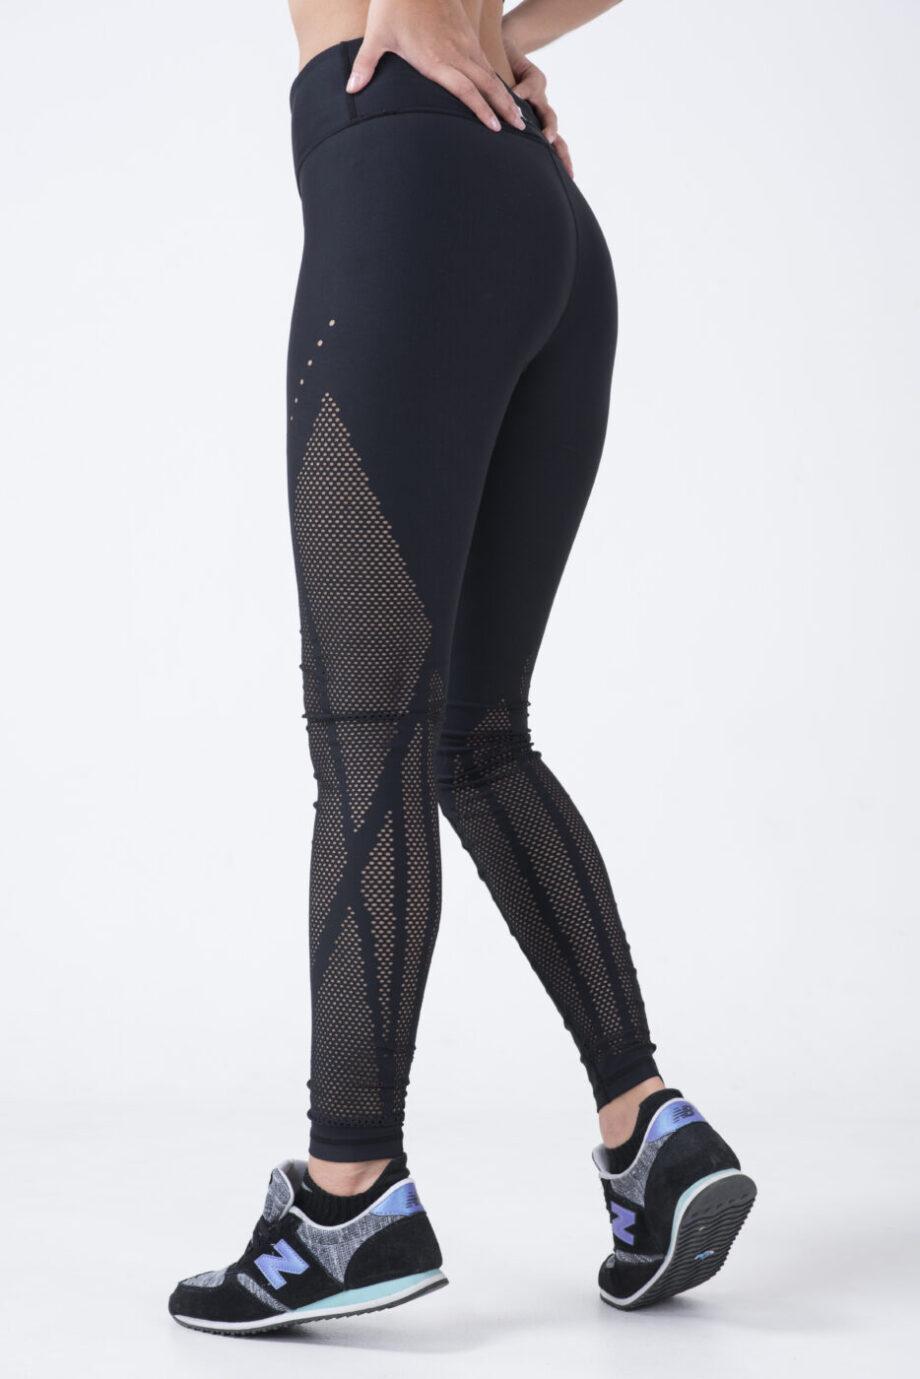 black training tights